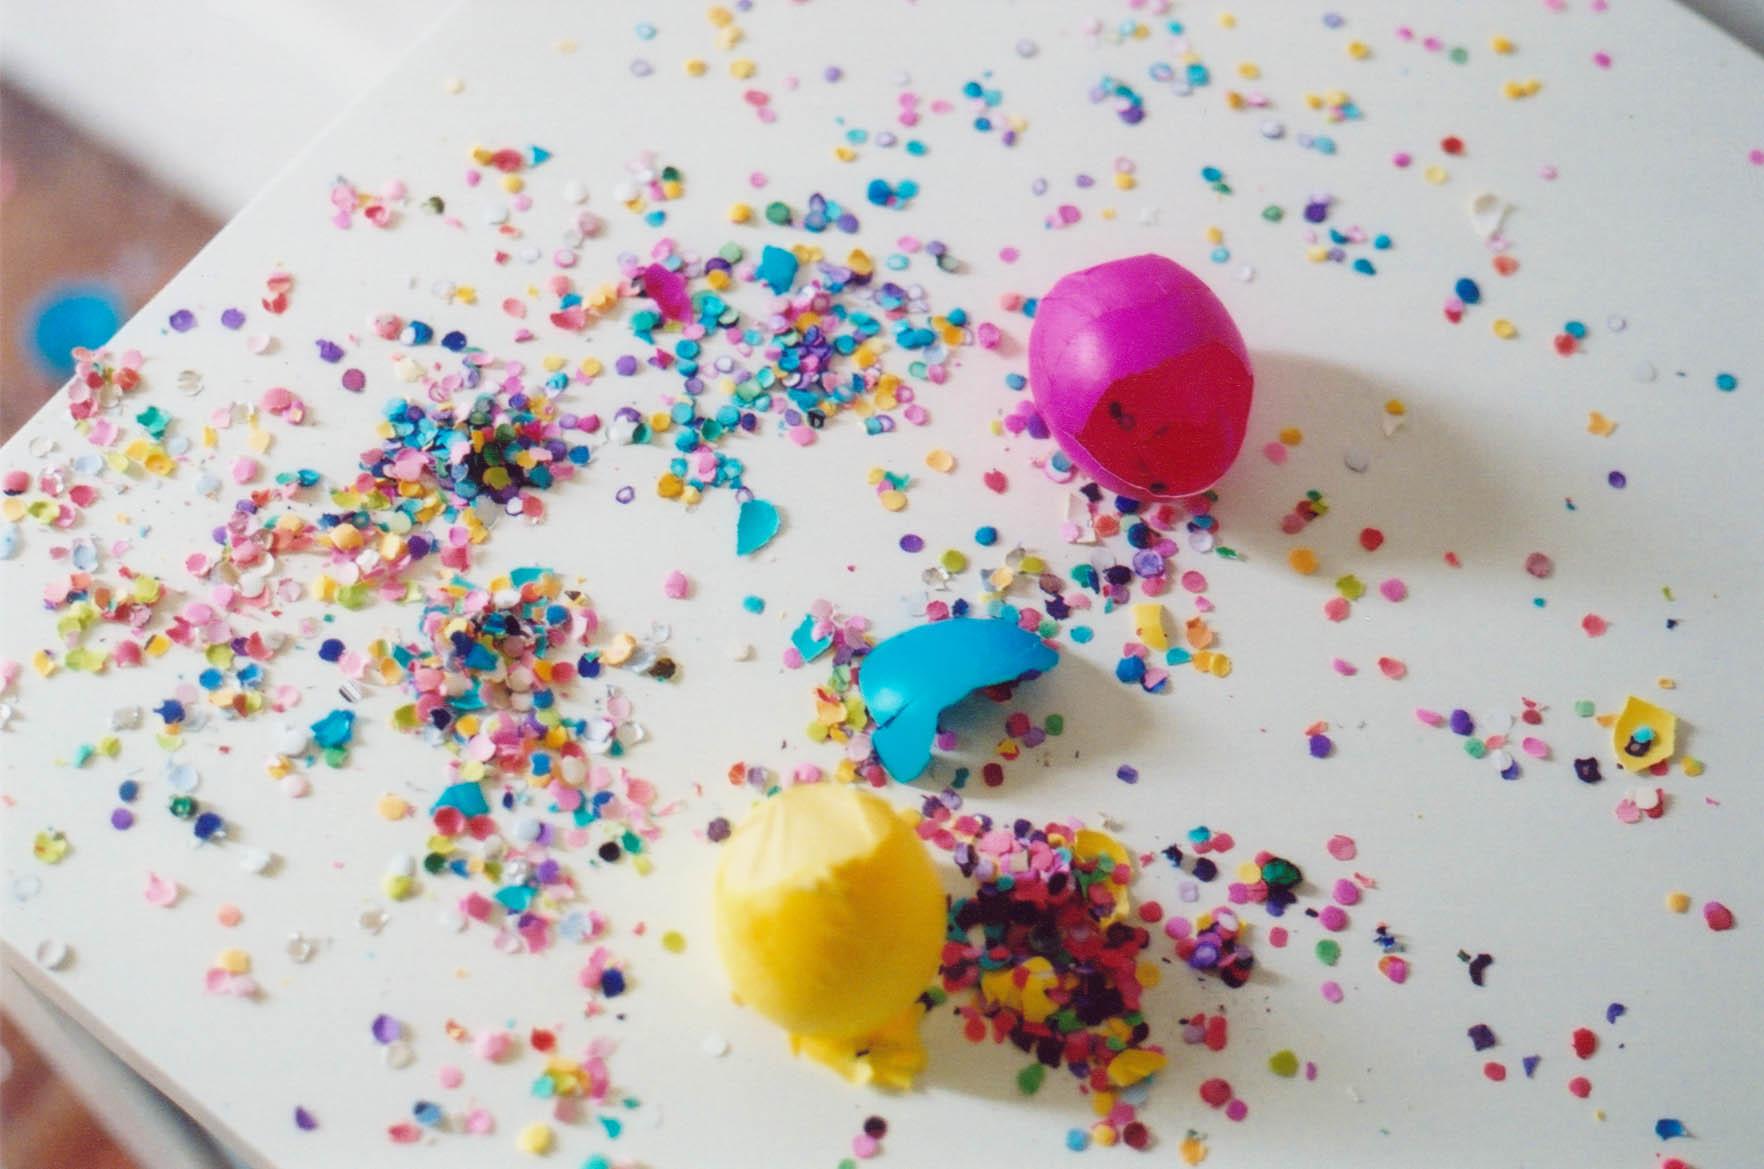 Five Things To Hide In Easter Eggs